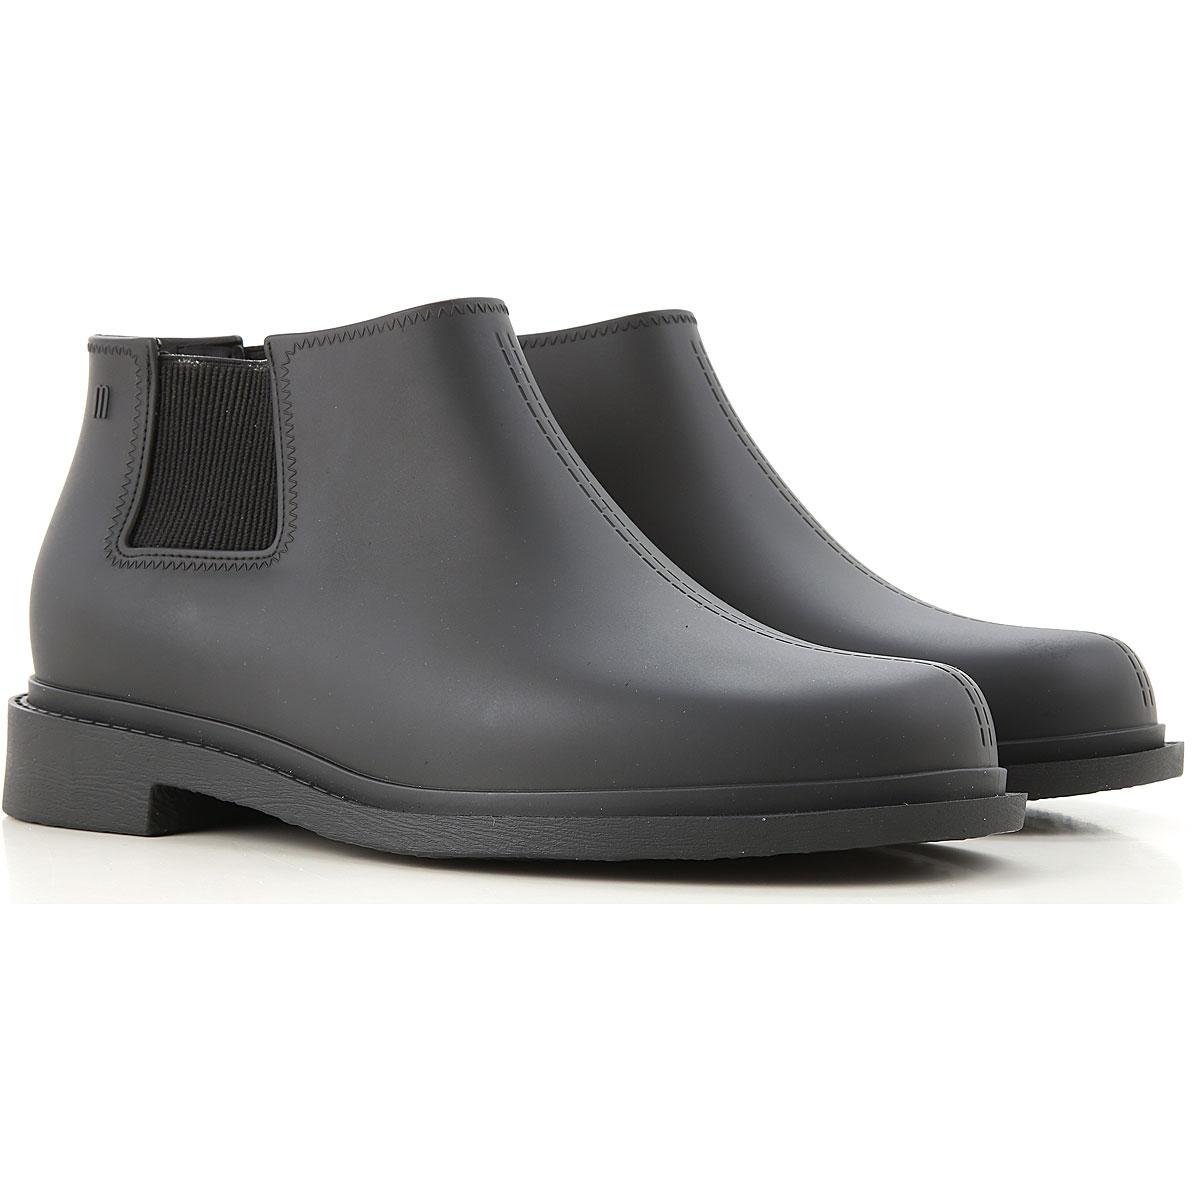 Melissa Boots for Men, Booties, Black, PVC, 2019, 8 9